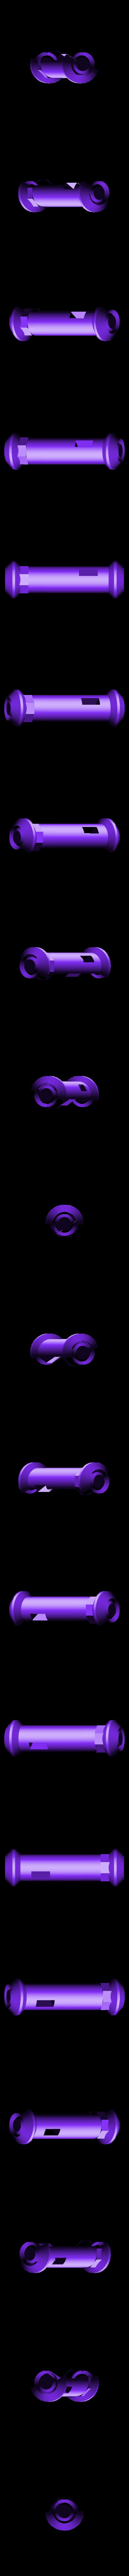 tow-cylinder.stl Download free STL file Tow Walker • 3D print model, ferjerez3d